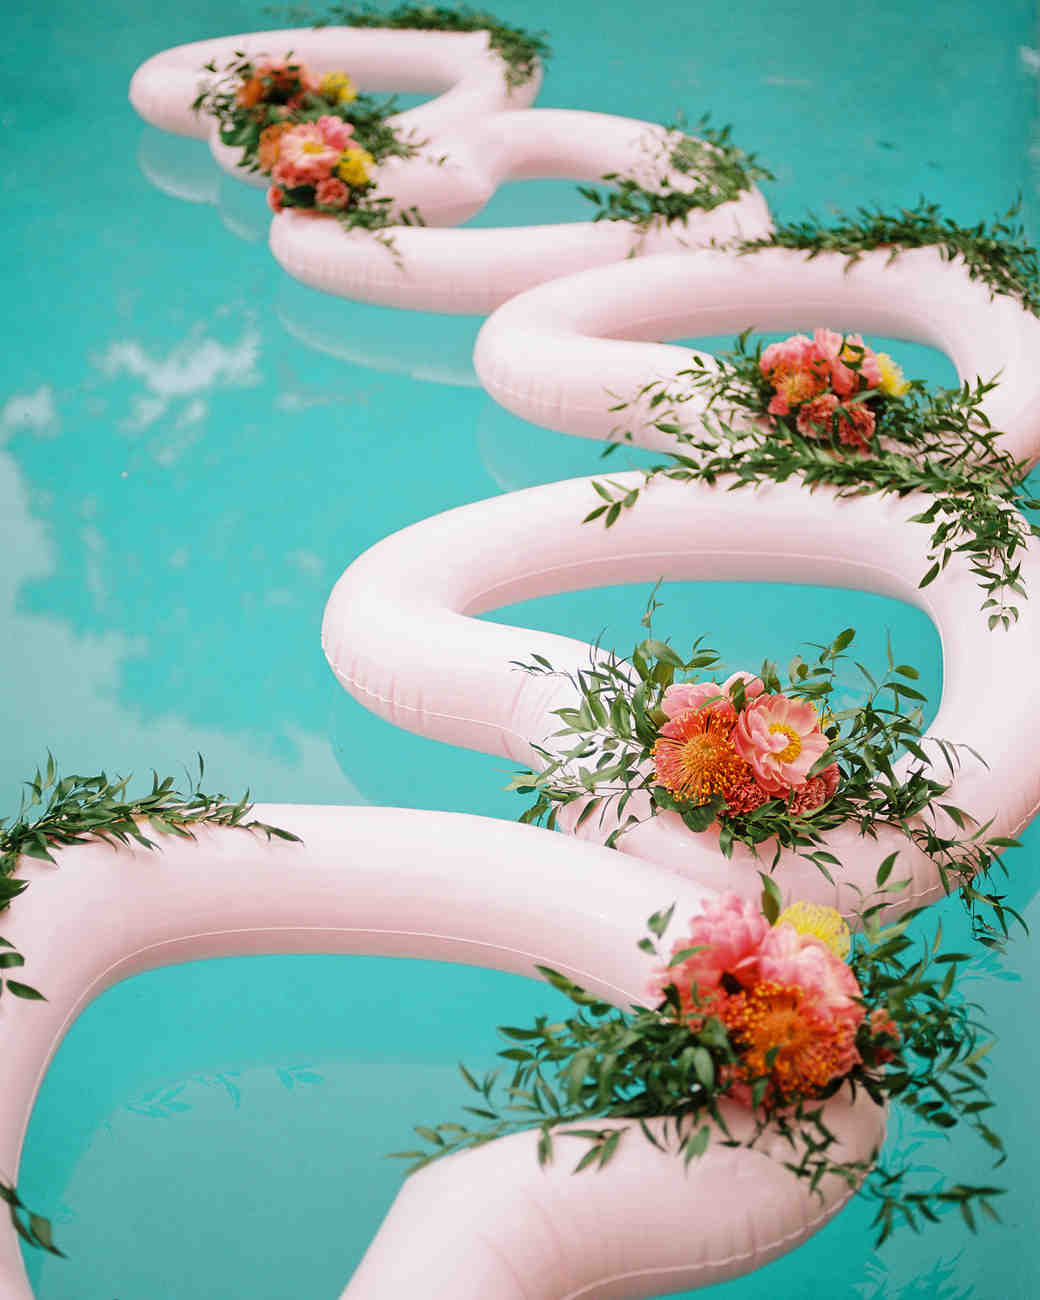 amy mark california pool floats heart